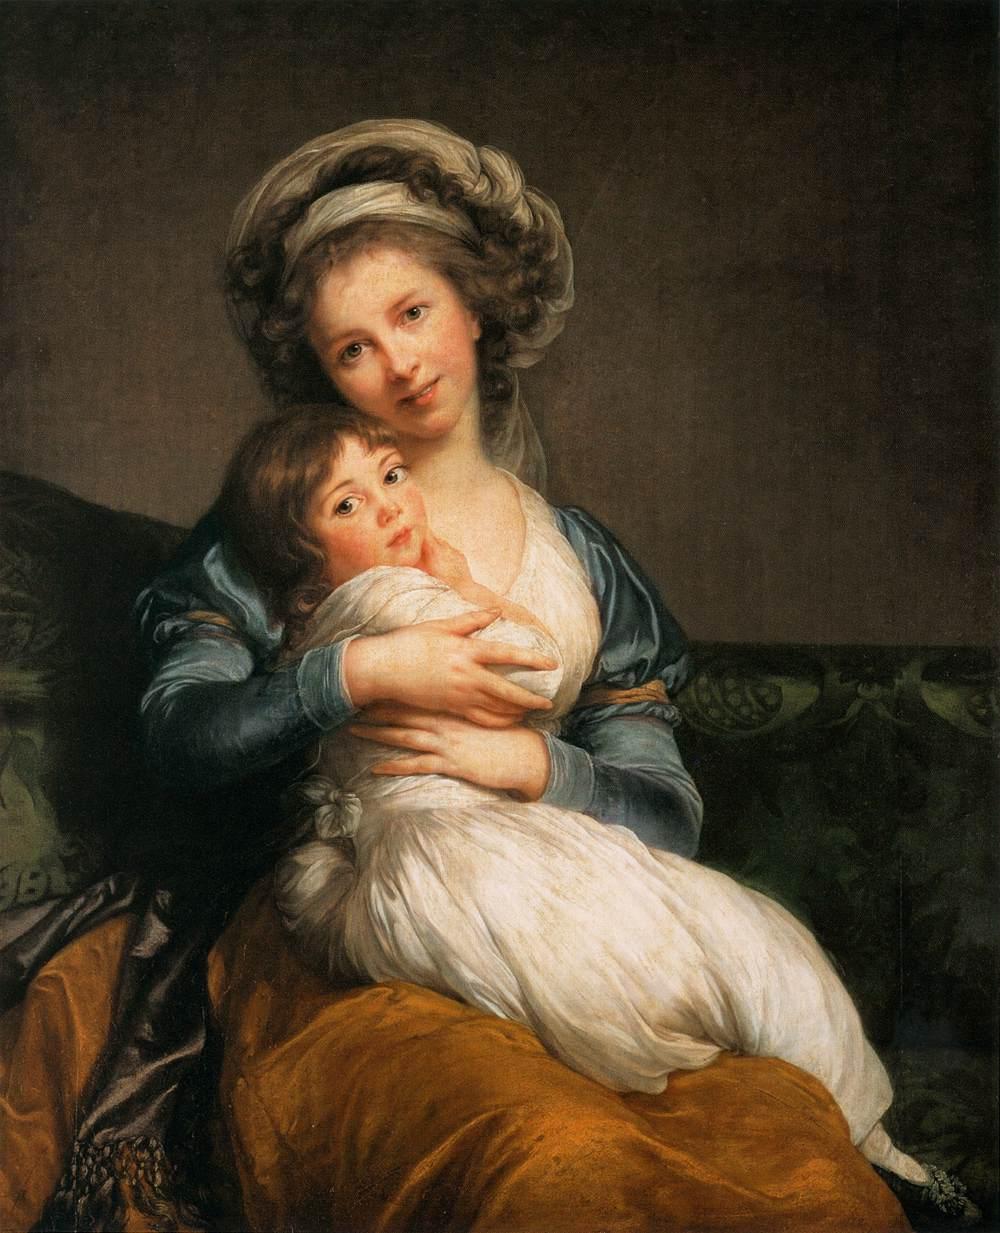 Elisabeth Vigée Lebrun, Self-Portrait with her Daughter, Julie, 1786, oil on panel, Musée du Louvre